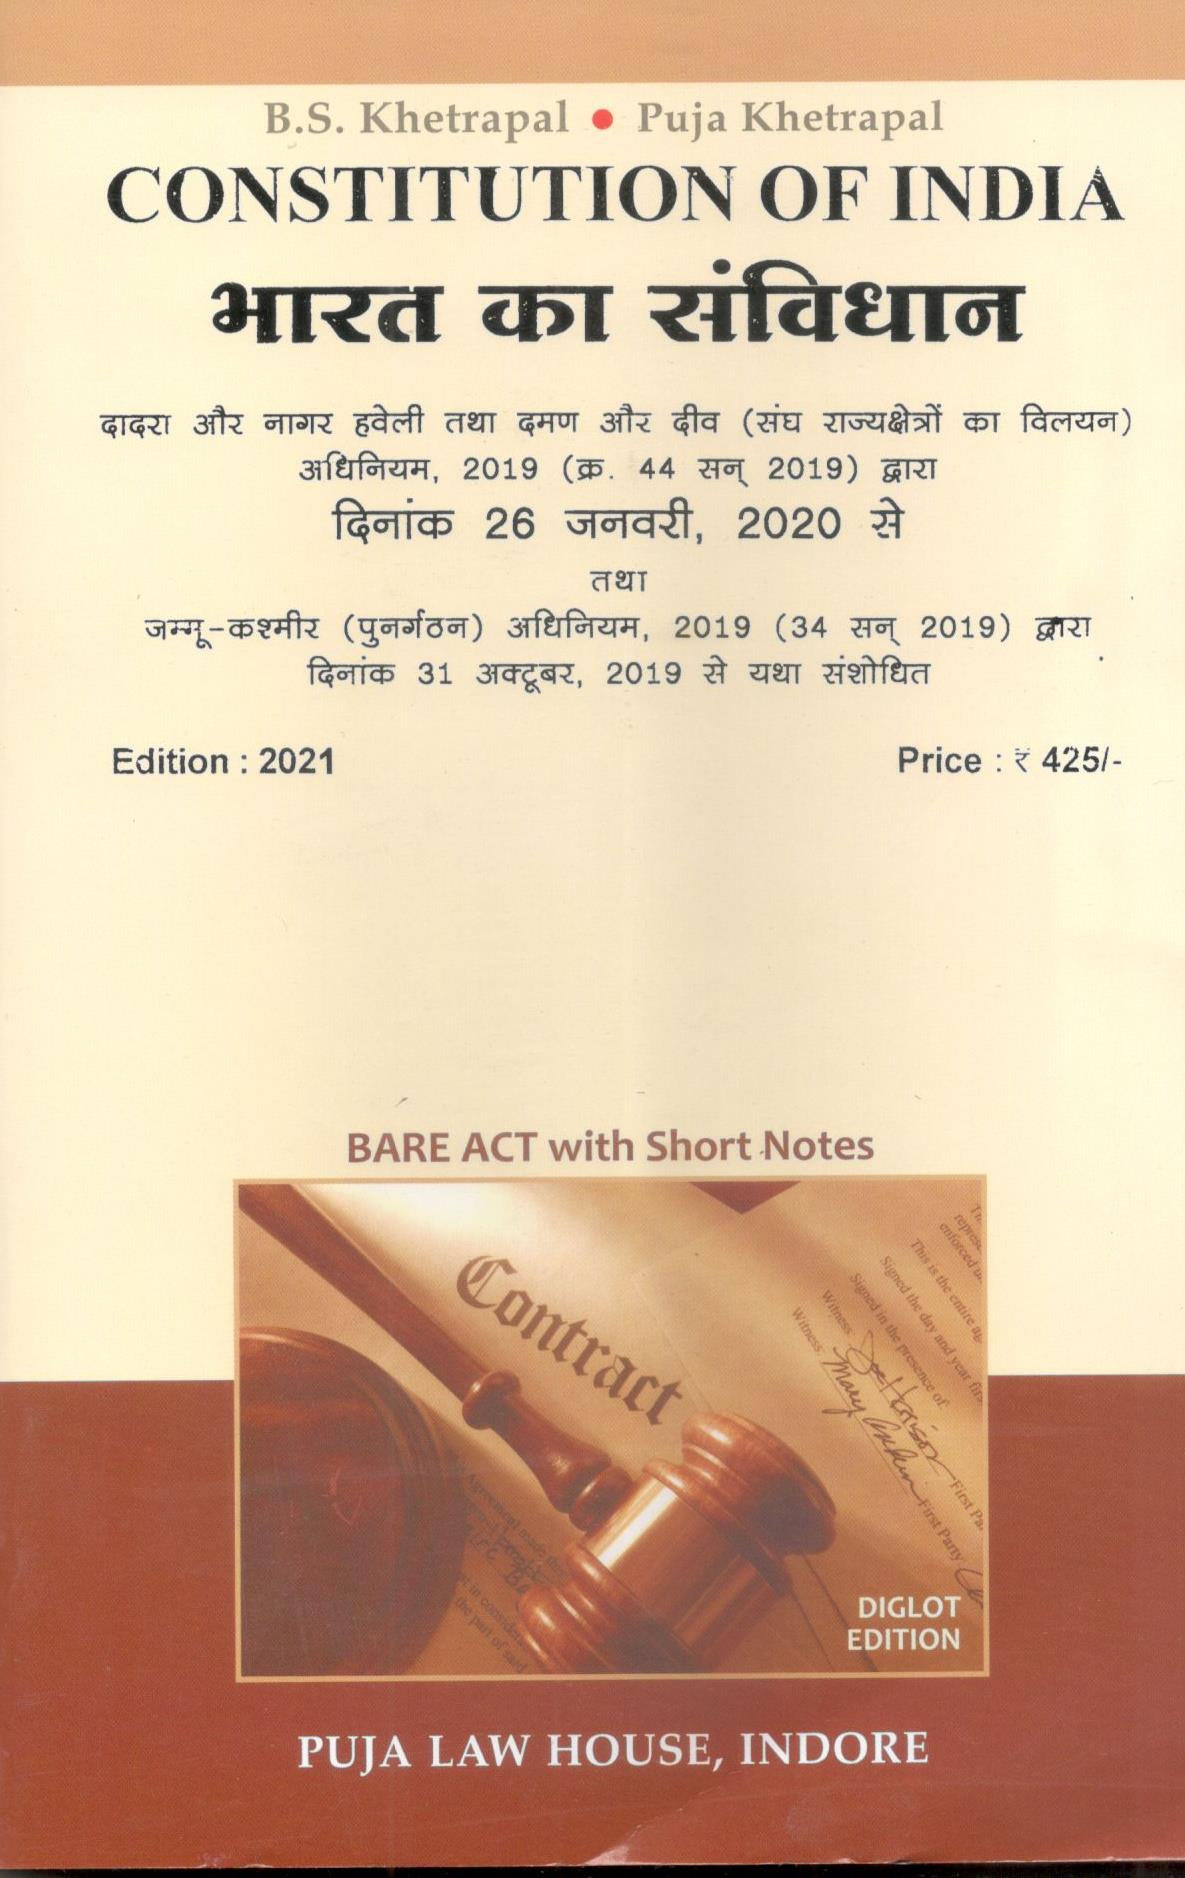 भारत का संविधान / Constitution of India